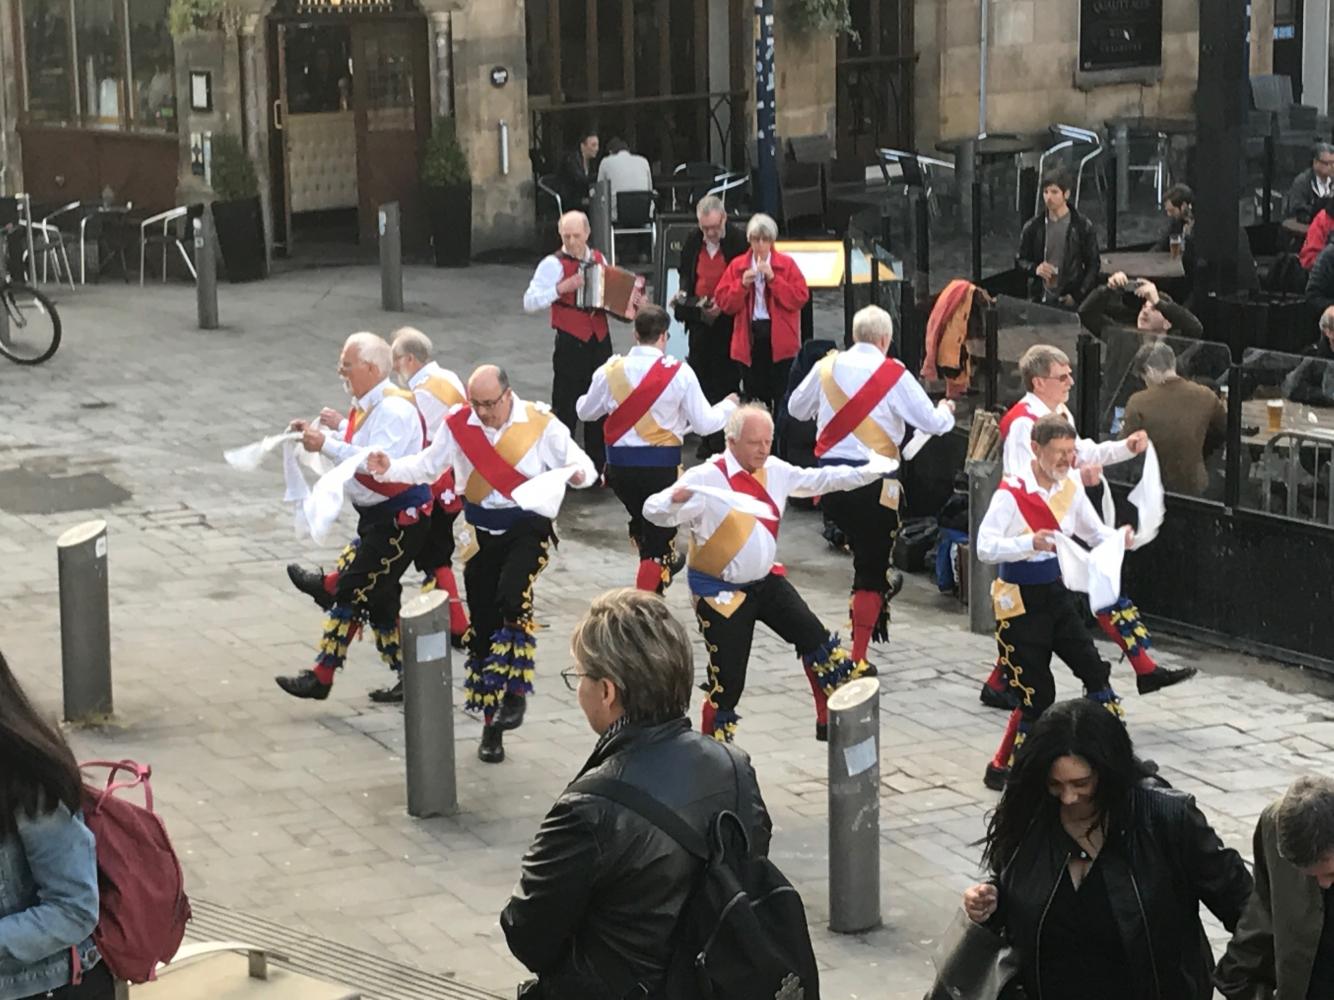 170608 Manchester Morris Dancers